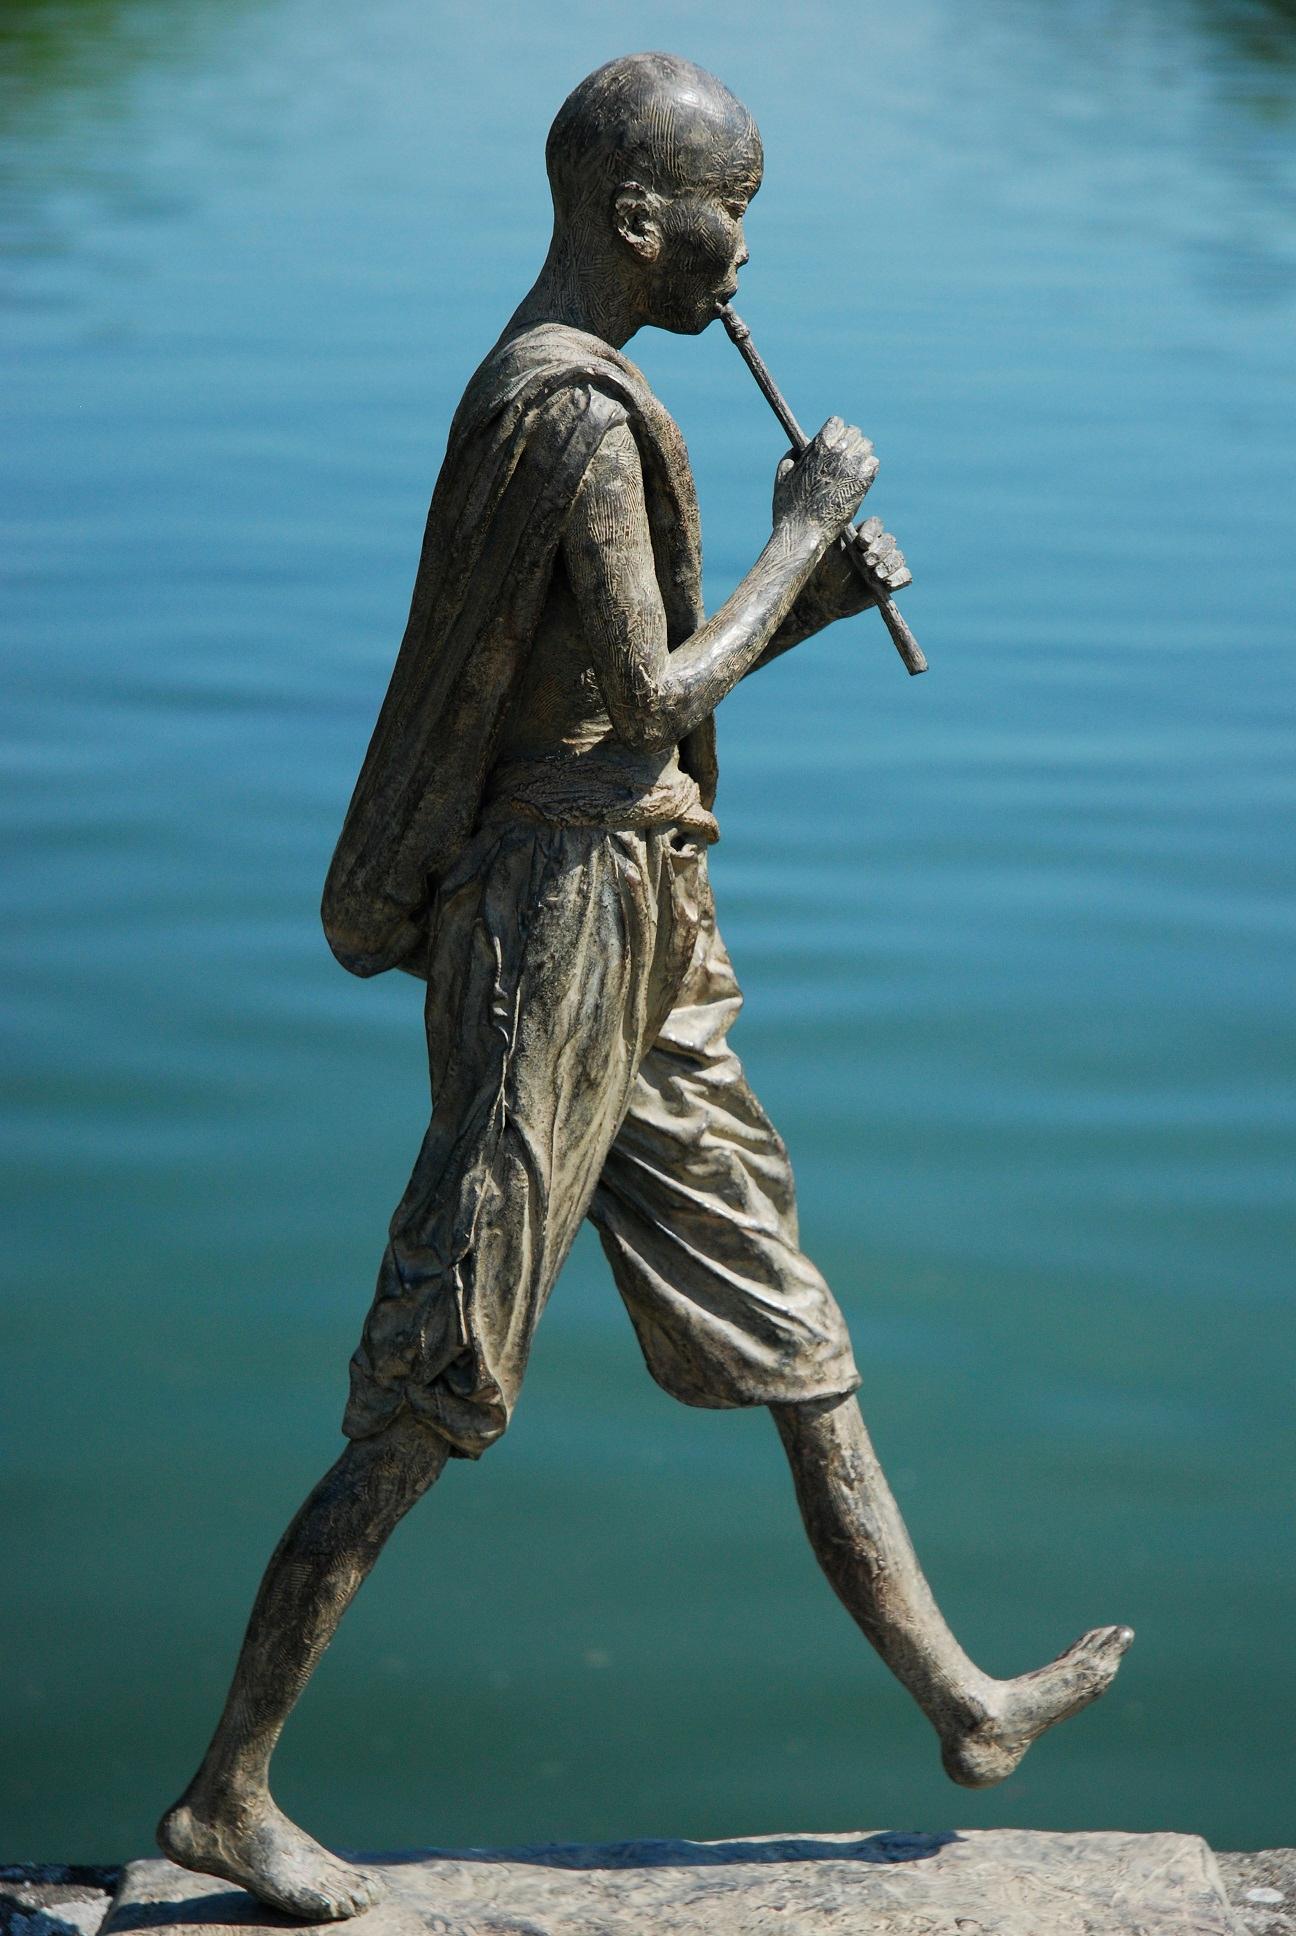 Flute Player by Marine de Soos - Large Outdoor Bronze Sculpture, Human Figure